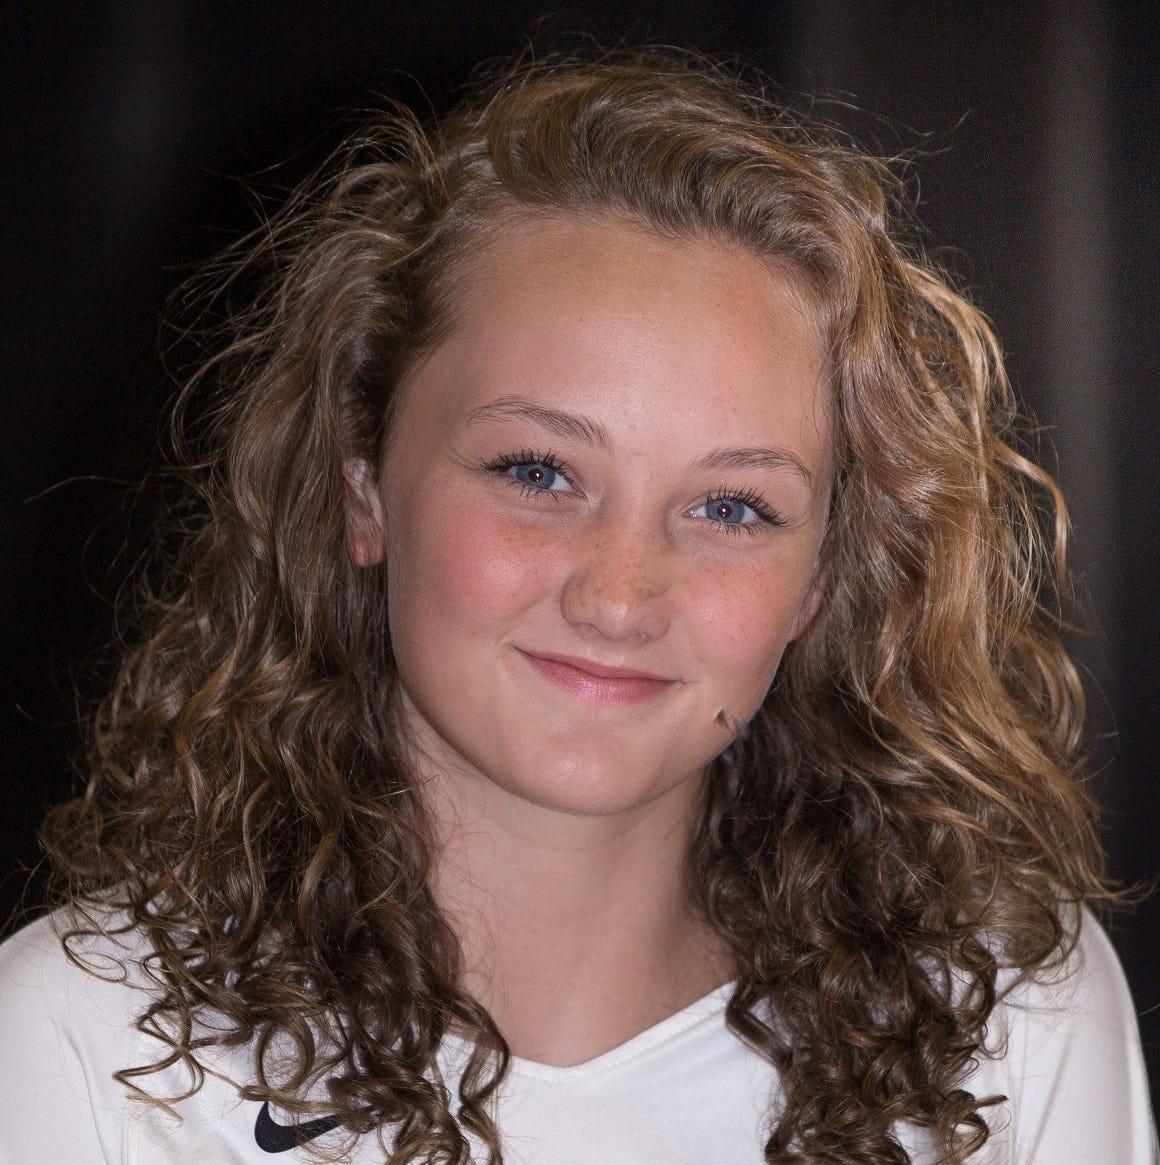 Camden's Abby Pierce named Week 5 female athlete of the week